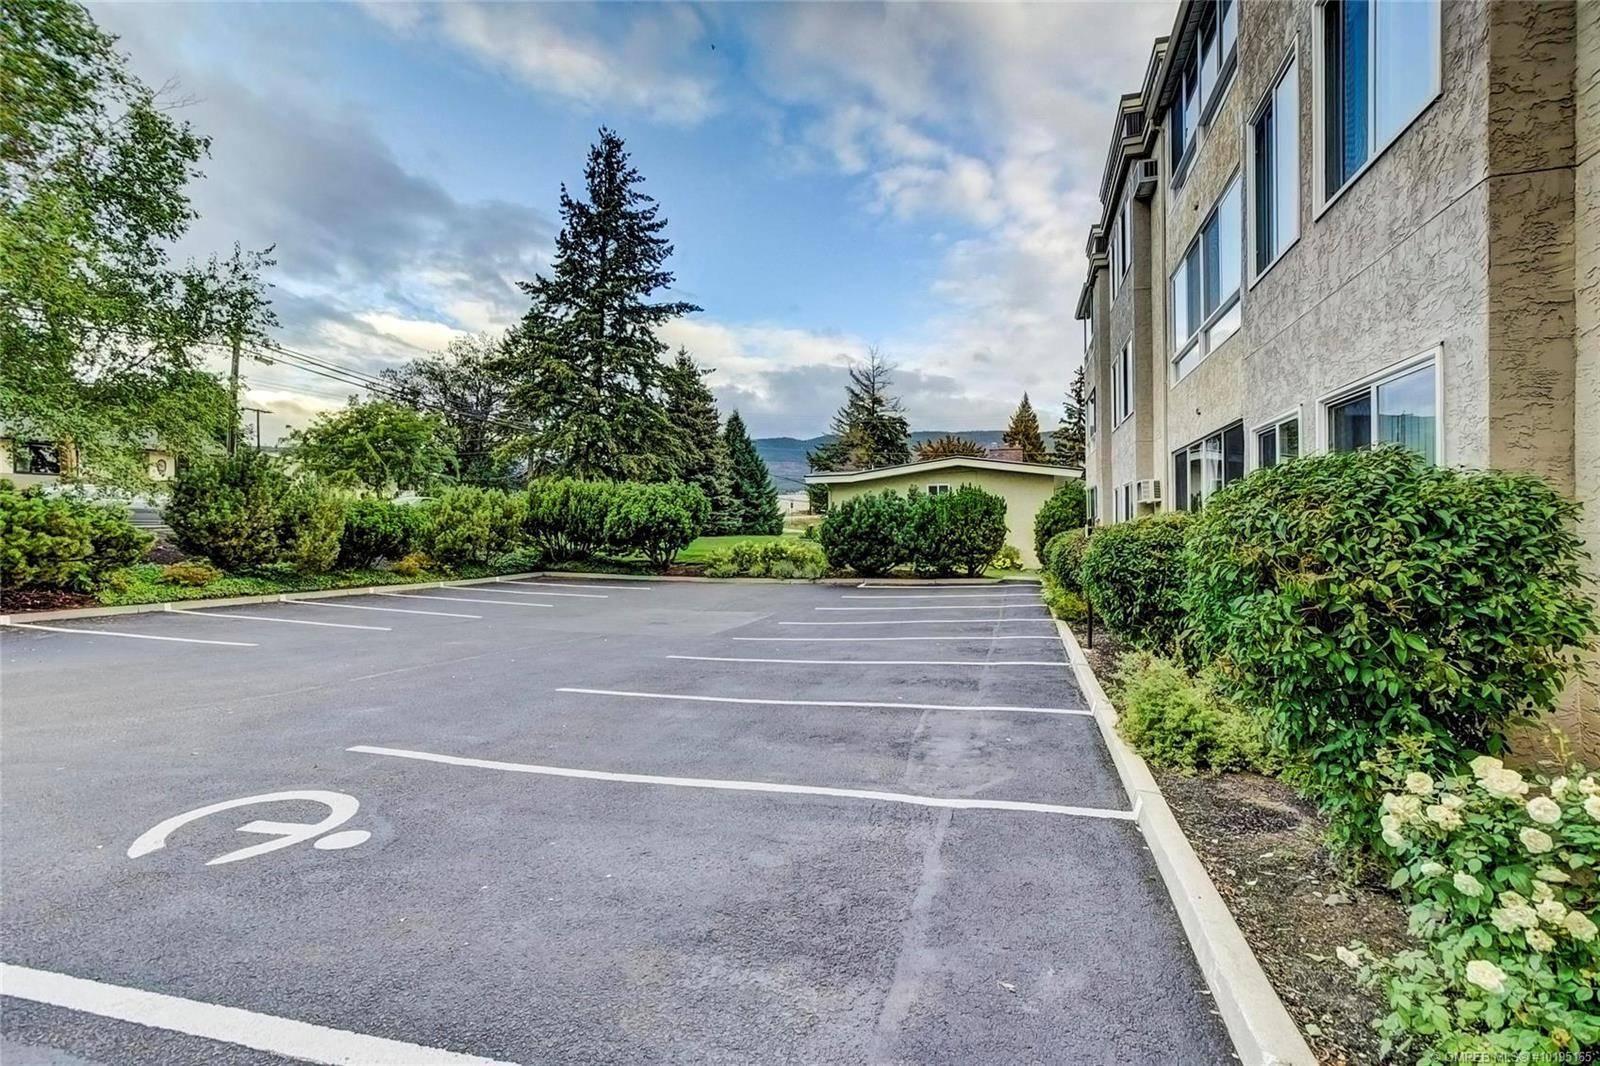 Condo for sale at 3815 Brown Rd Unit 103 West Kelowna British Columbia - MLS: 10195165